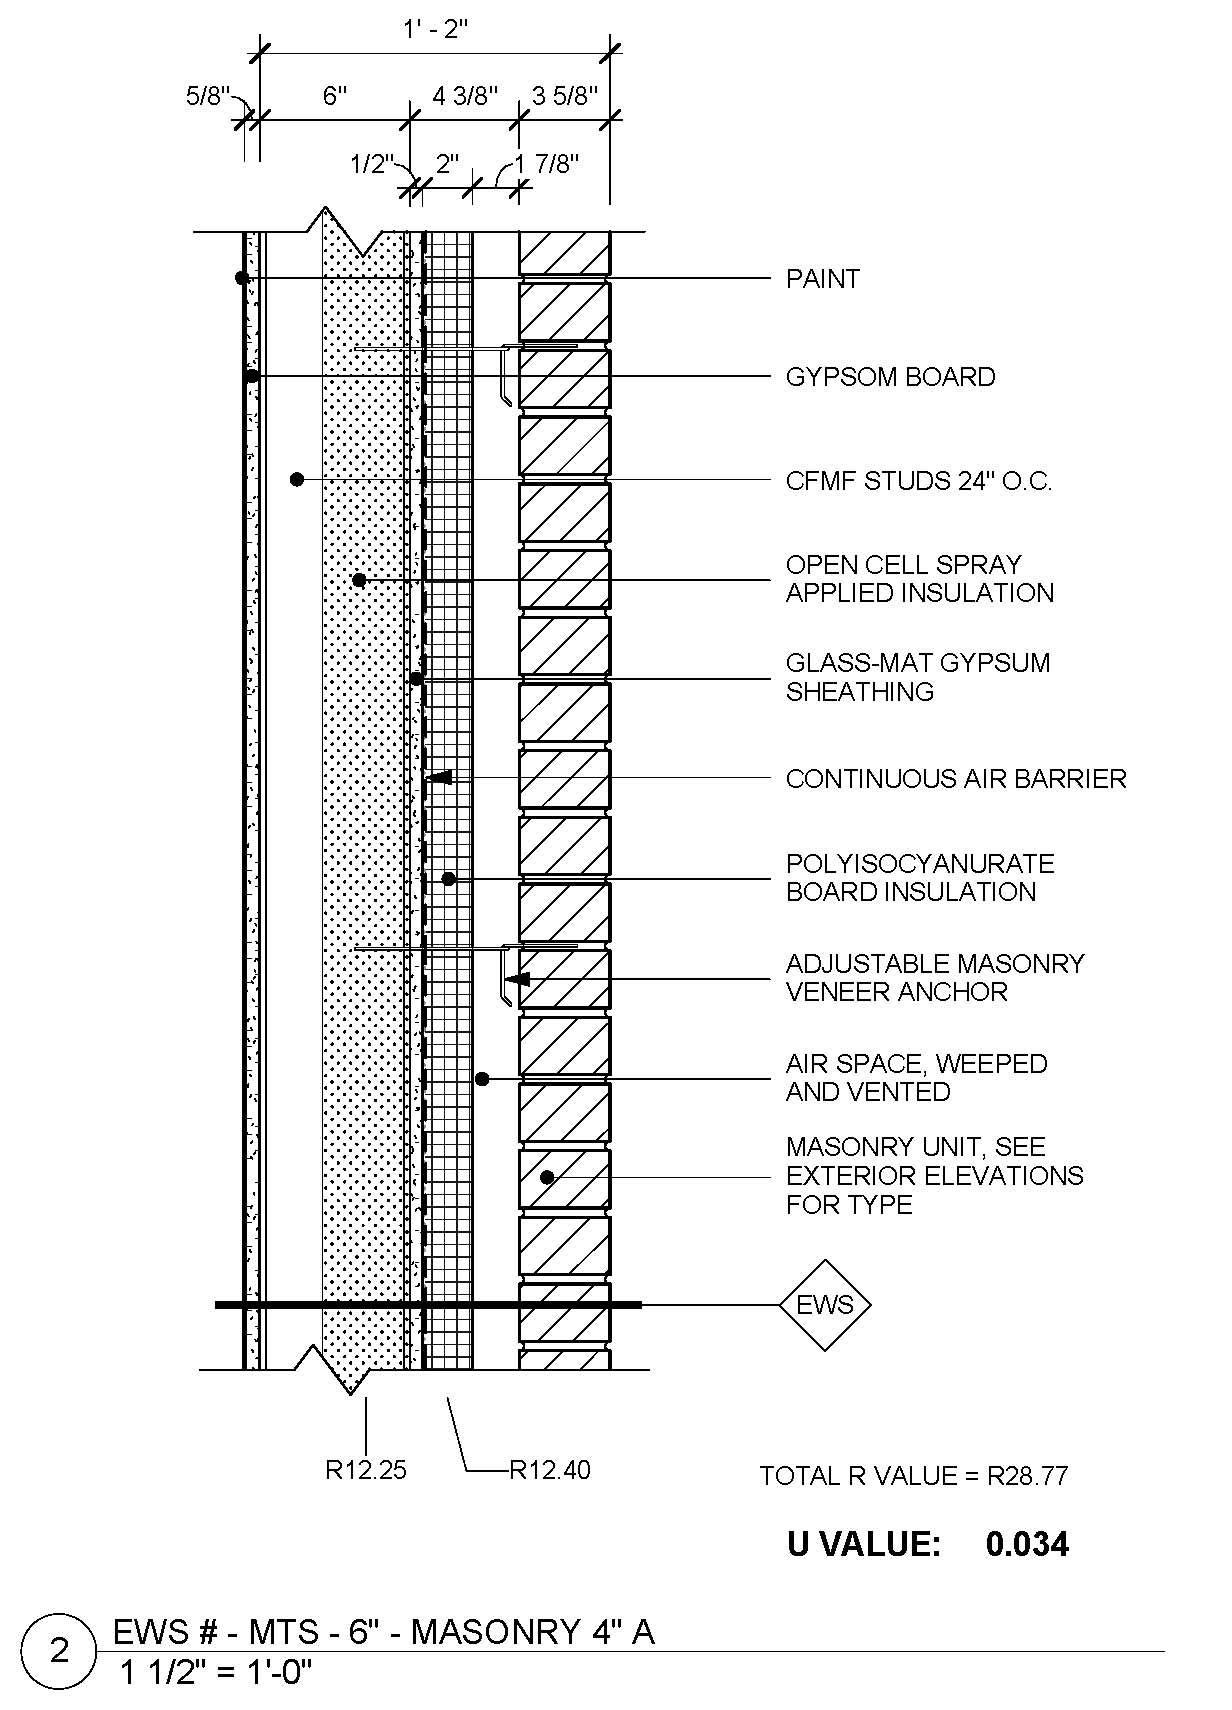 Stone Veneer Details : Check out our revised metal framed masonry veneer standard